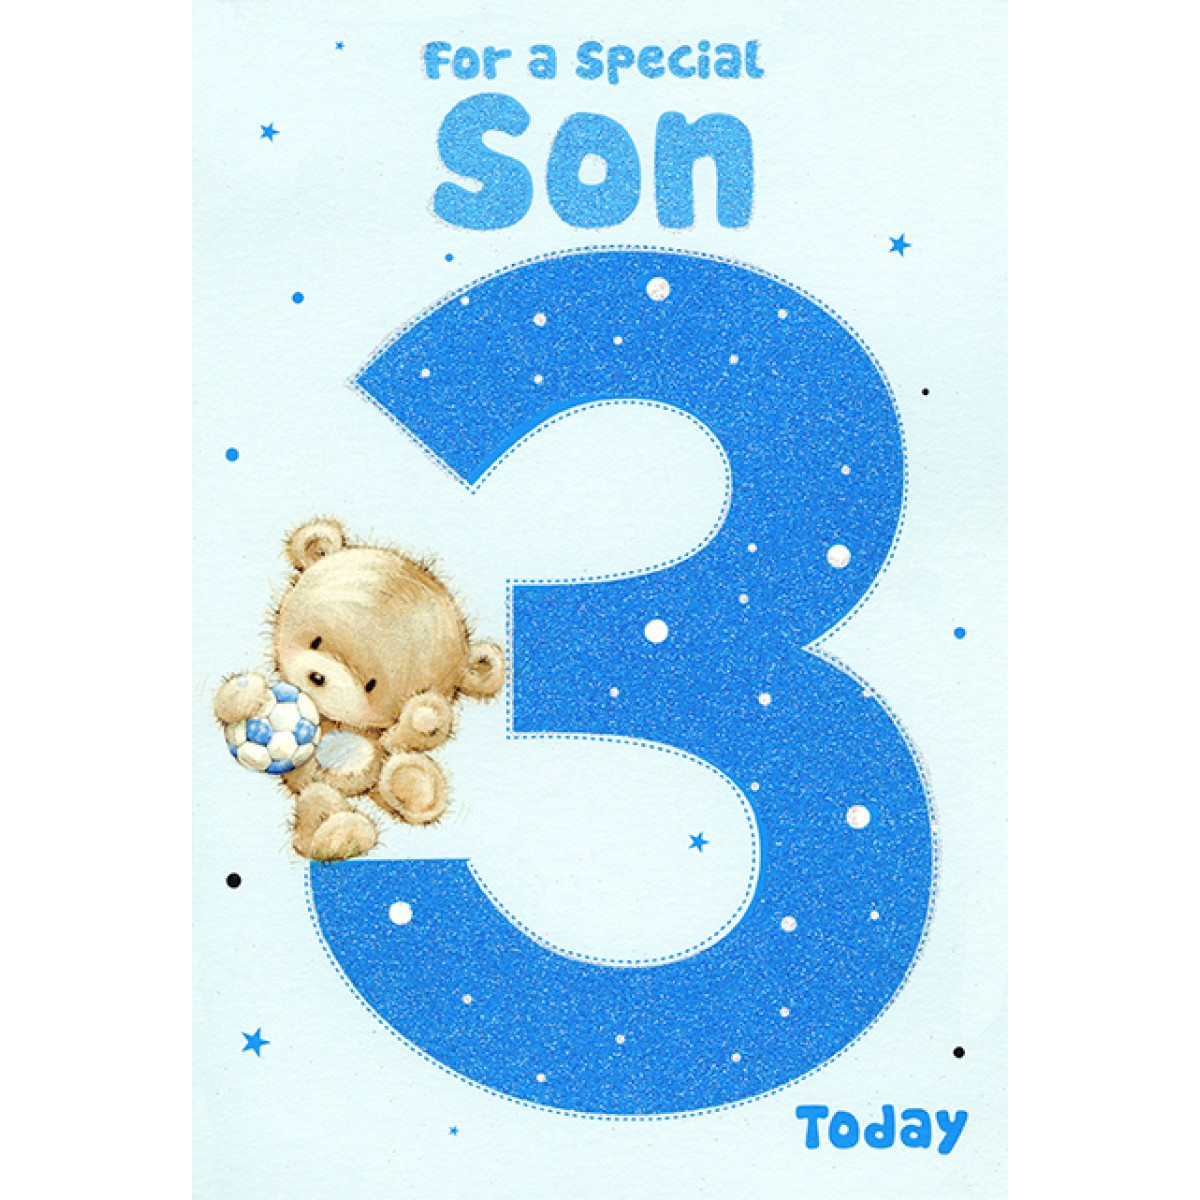 70+ Amazing 3rd Birthday Wishes For Children - Birthday Wishes Zone